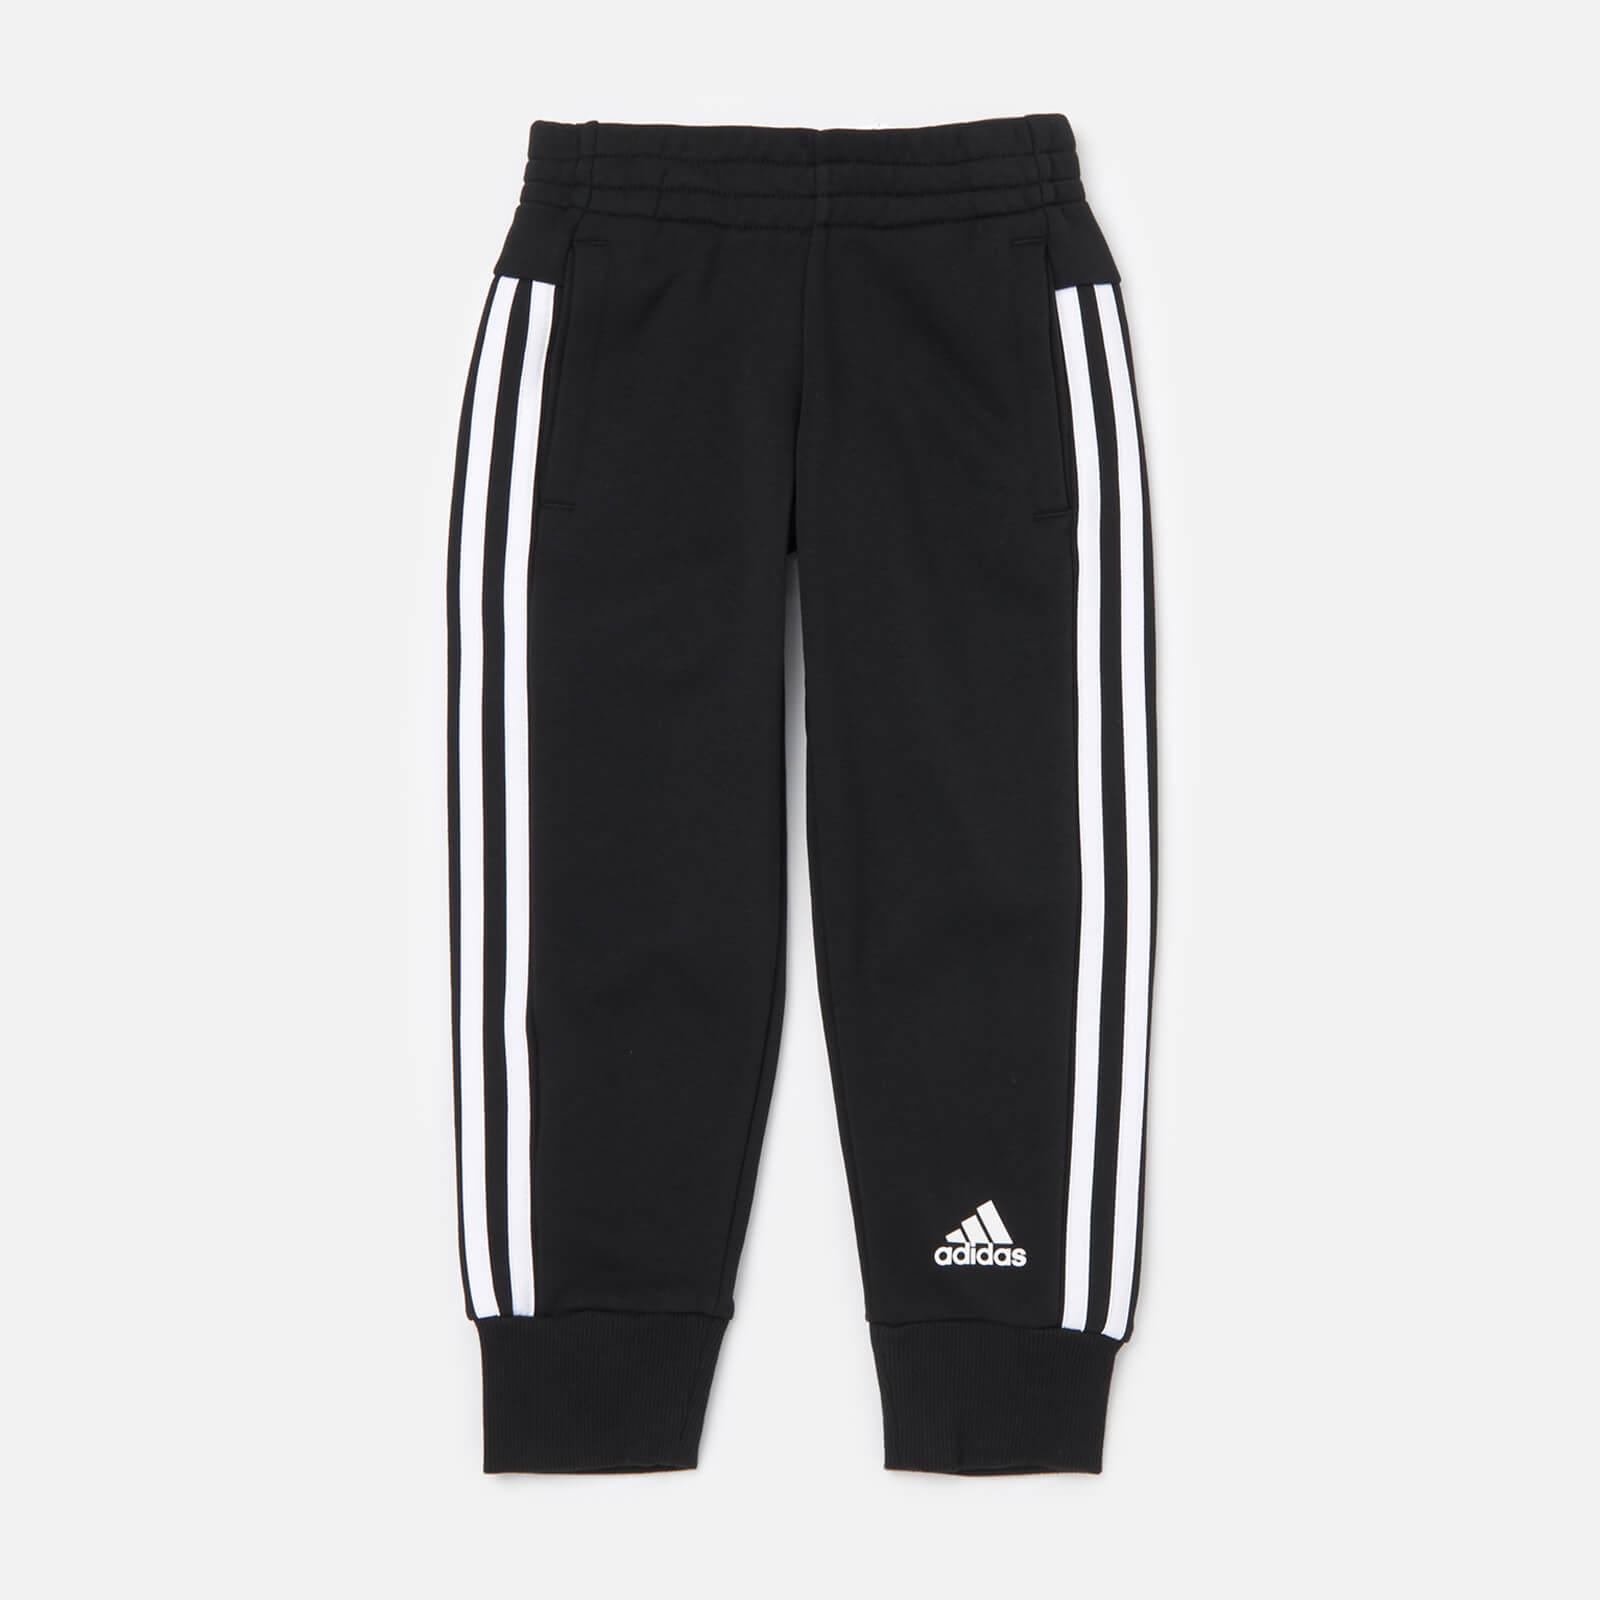 adidas Girls' Young Girls 3 Stripe Pants - Black - 11-12 Years